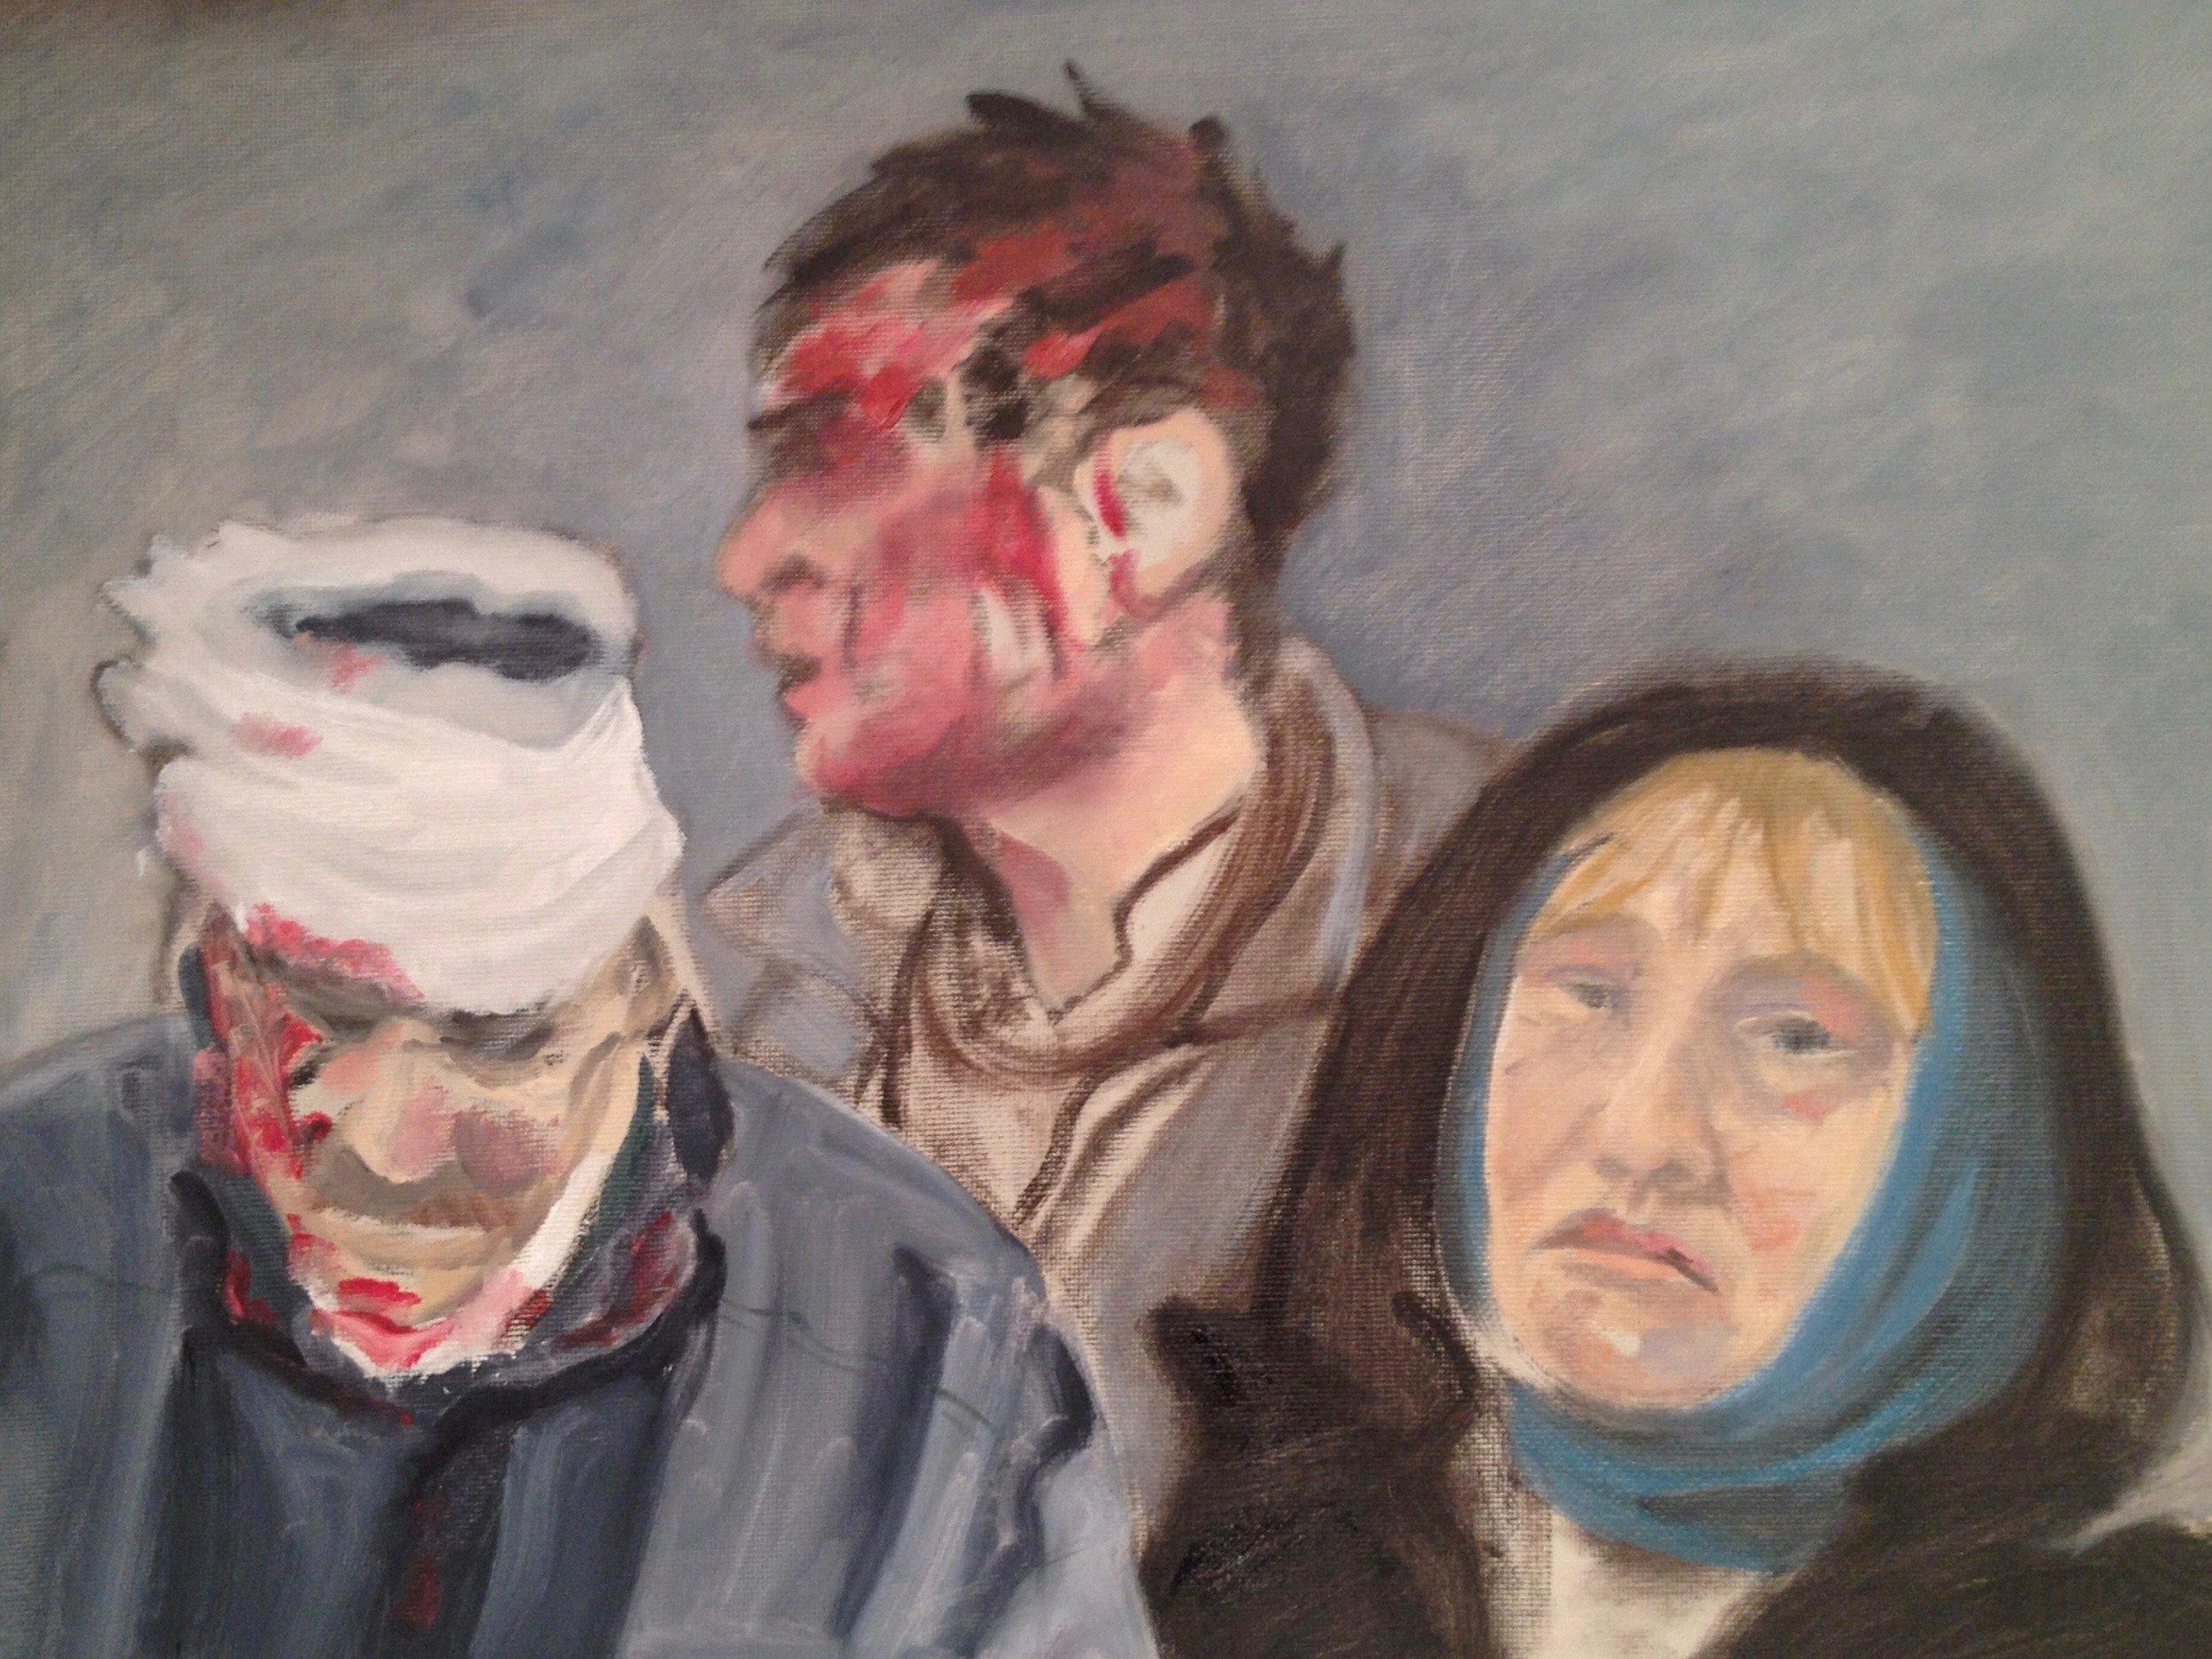 "Rag Tagged Rebellion / Ukraine 12"" x 16"" Oil on Canvas Board, 2014"